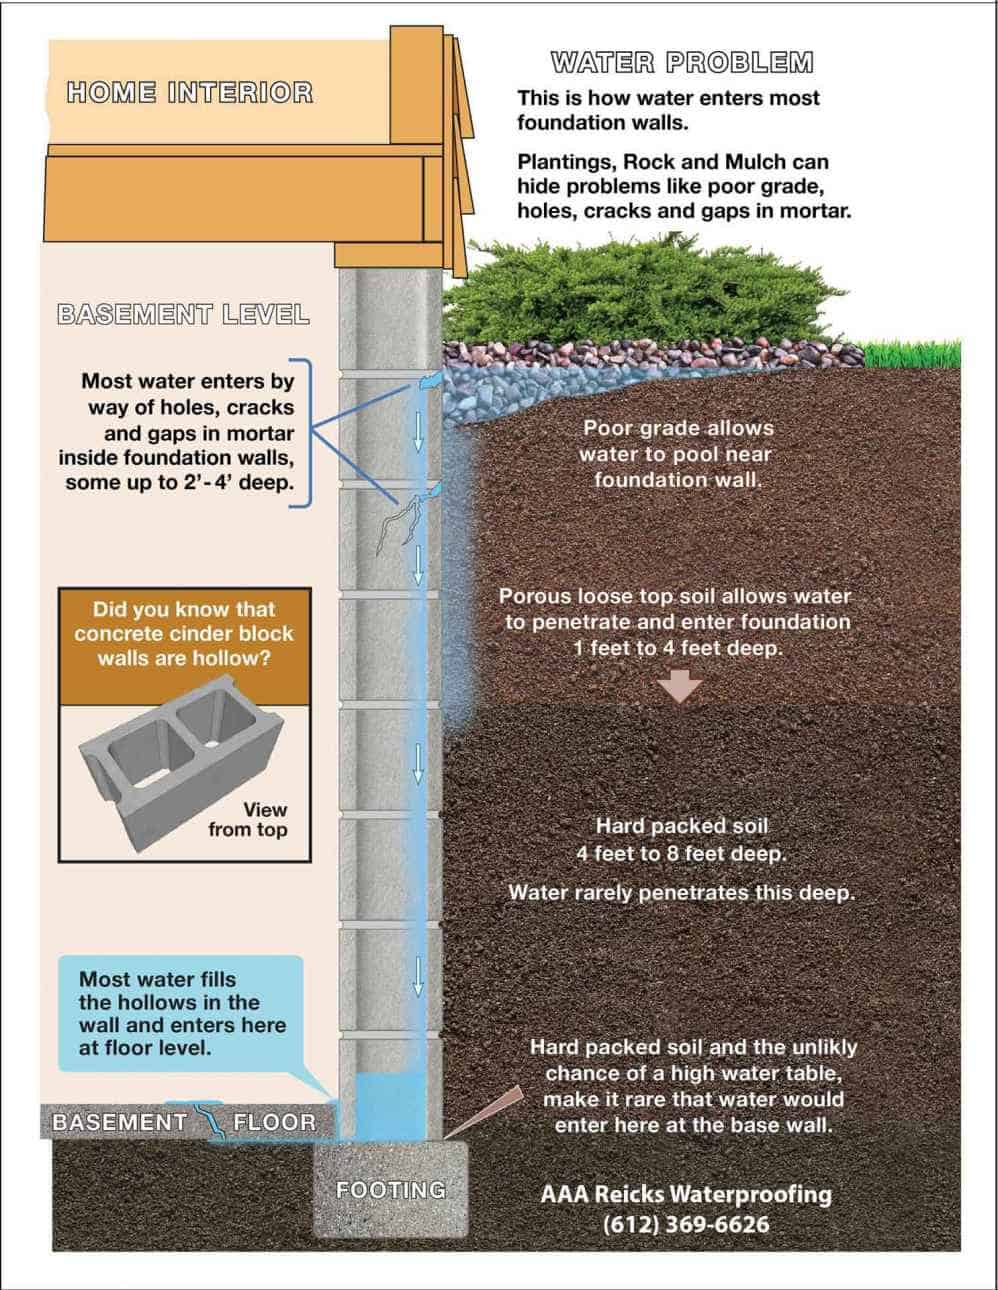 Concrete block problems areas